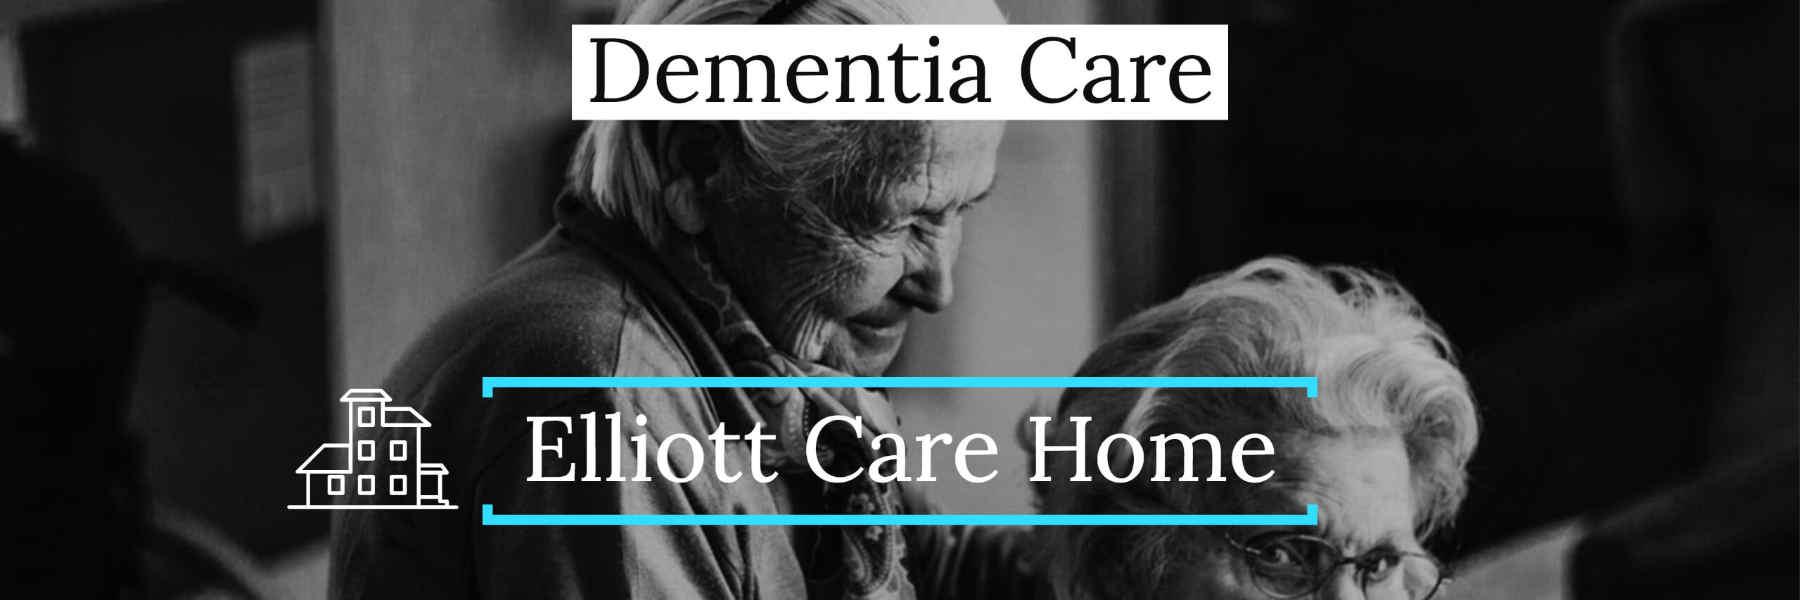 Elliott Dementia Residential Care Home Leicester Banner